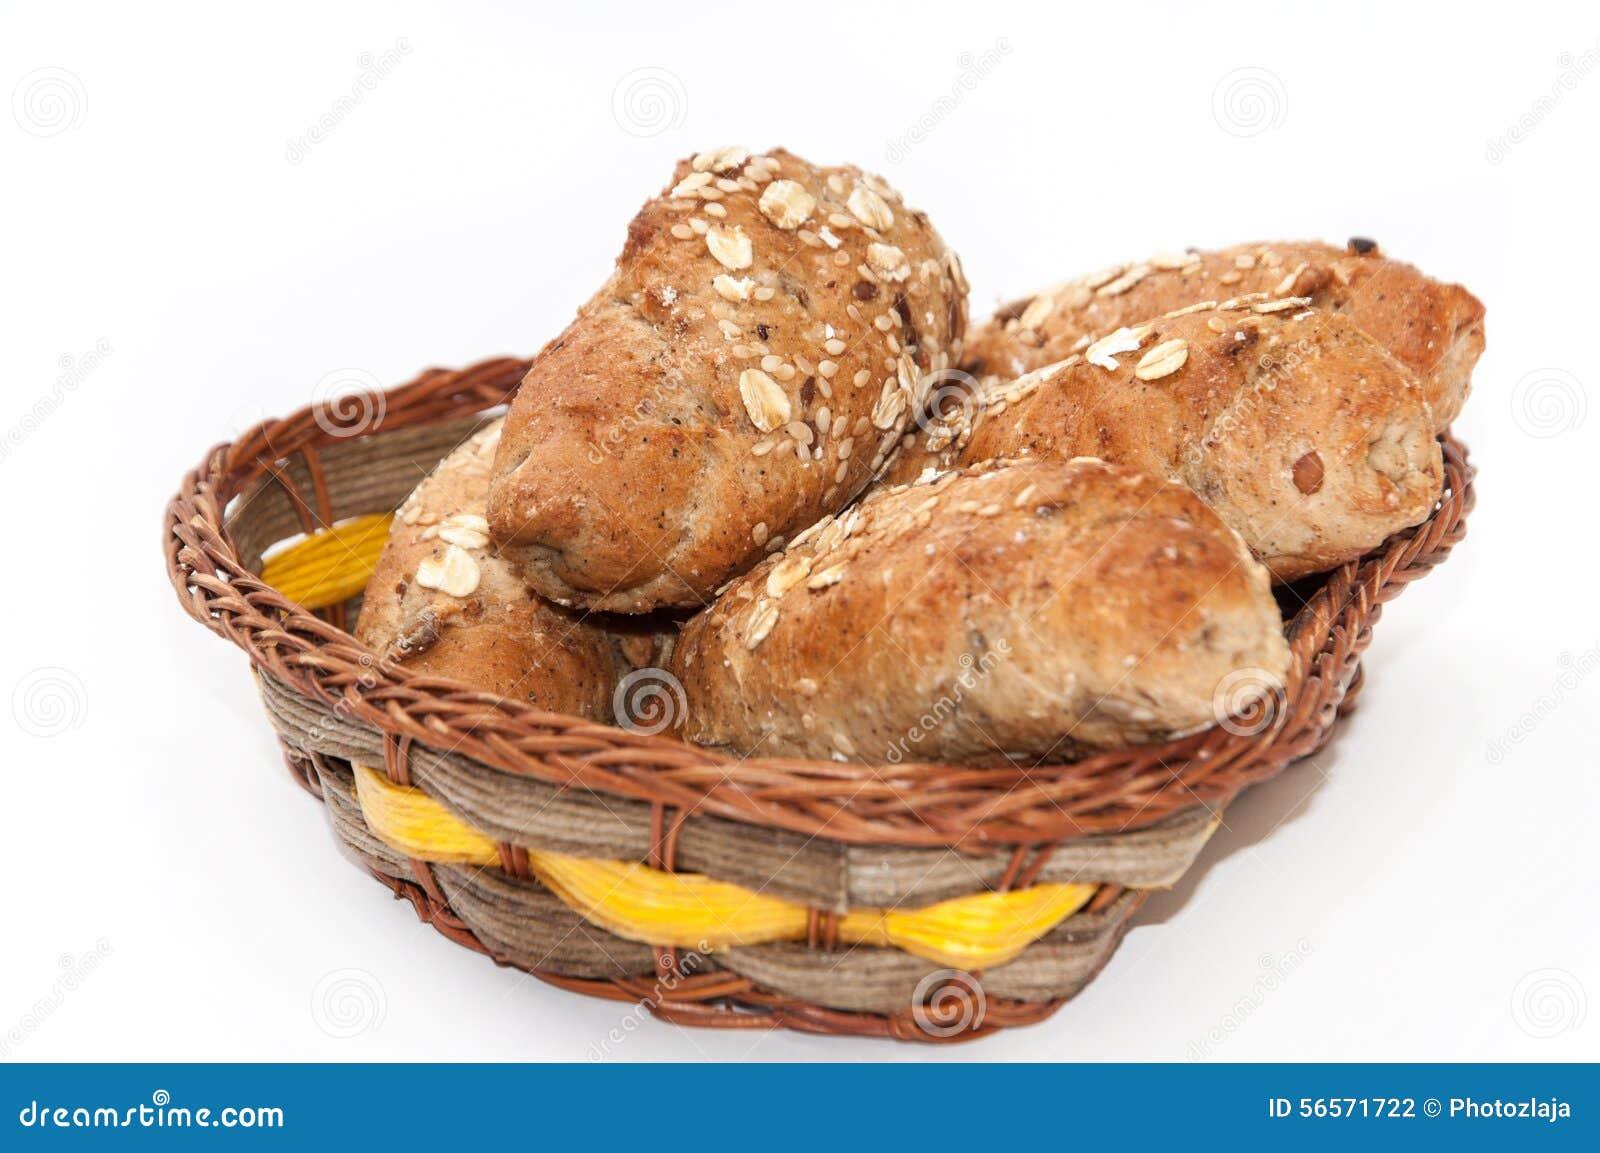 Download Ρόλοι με το ακέραια αλεύρι και το σιτάρι σε ένα καλάθι Στοκ Εικόνες - εικόνα από διατροφή, χορτάρι: 56571722